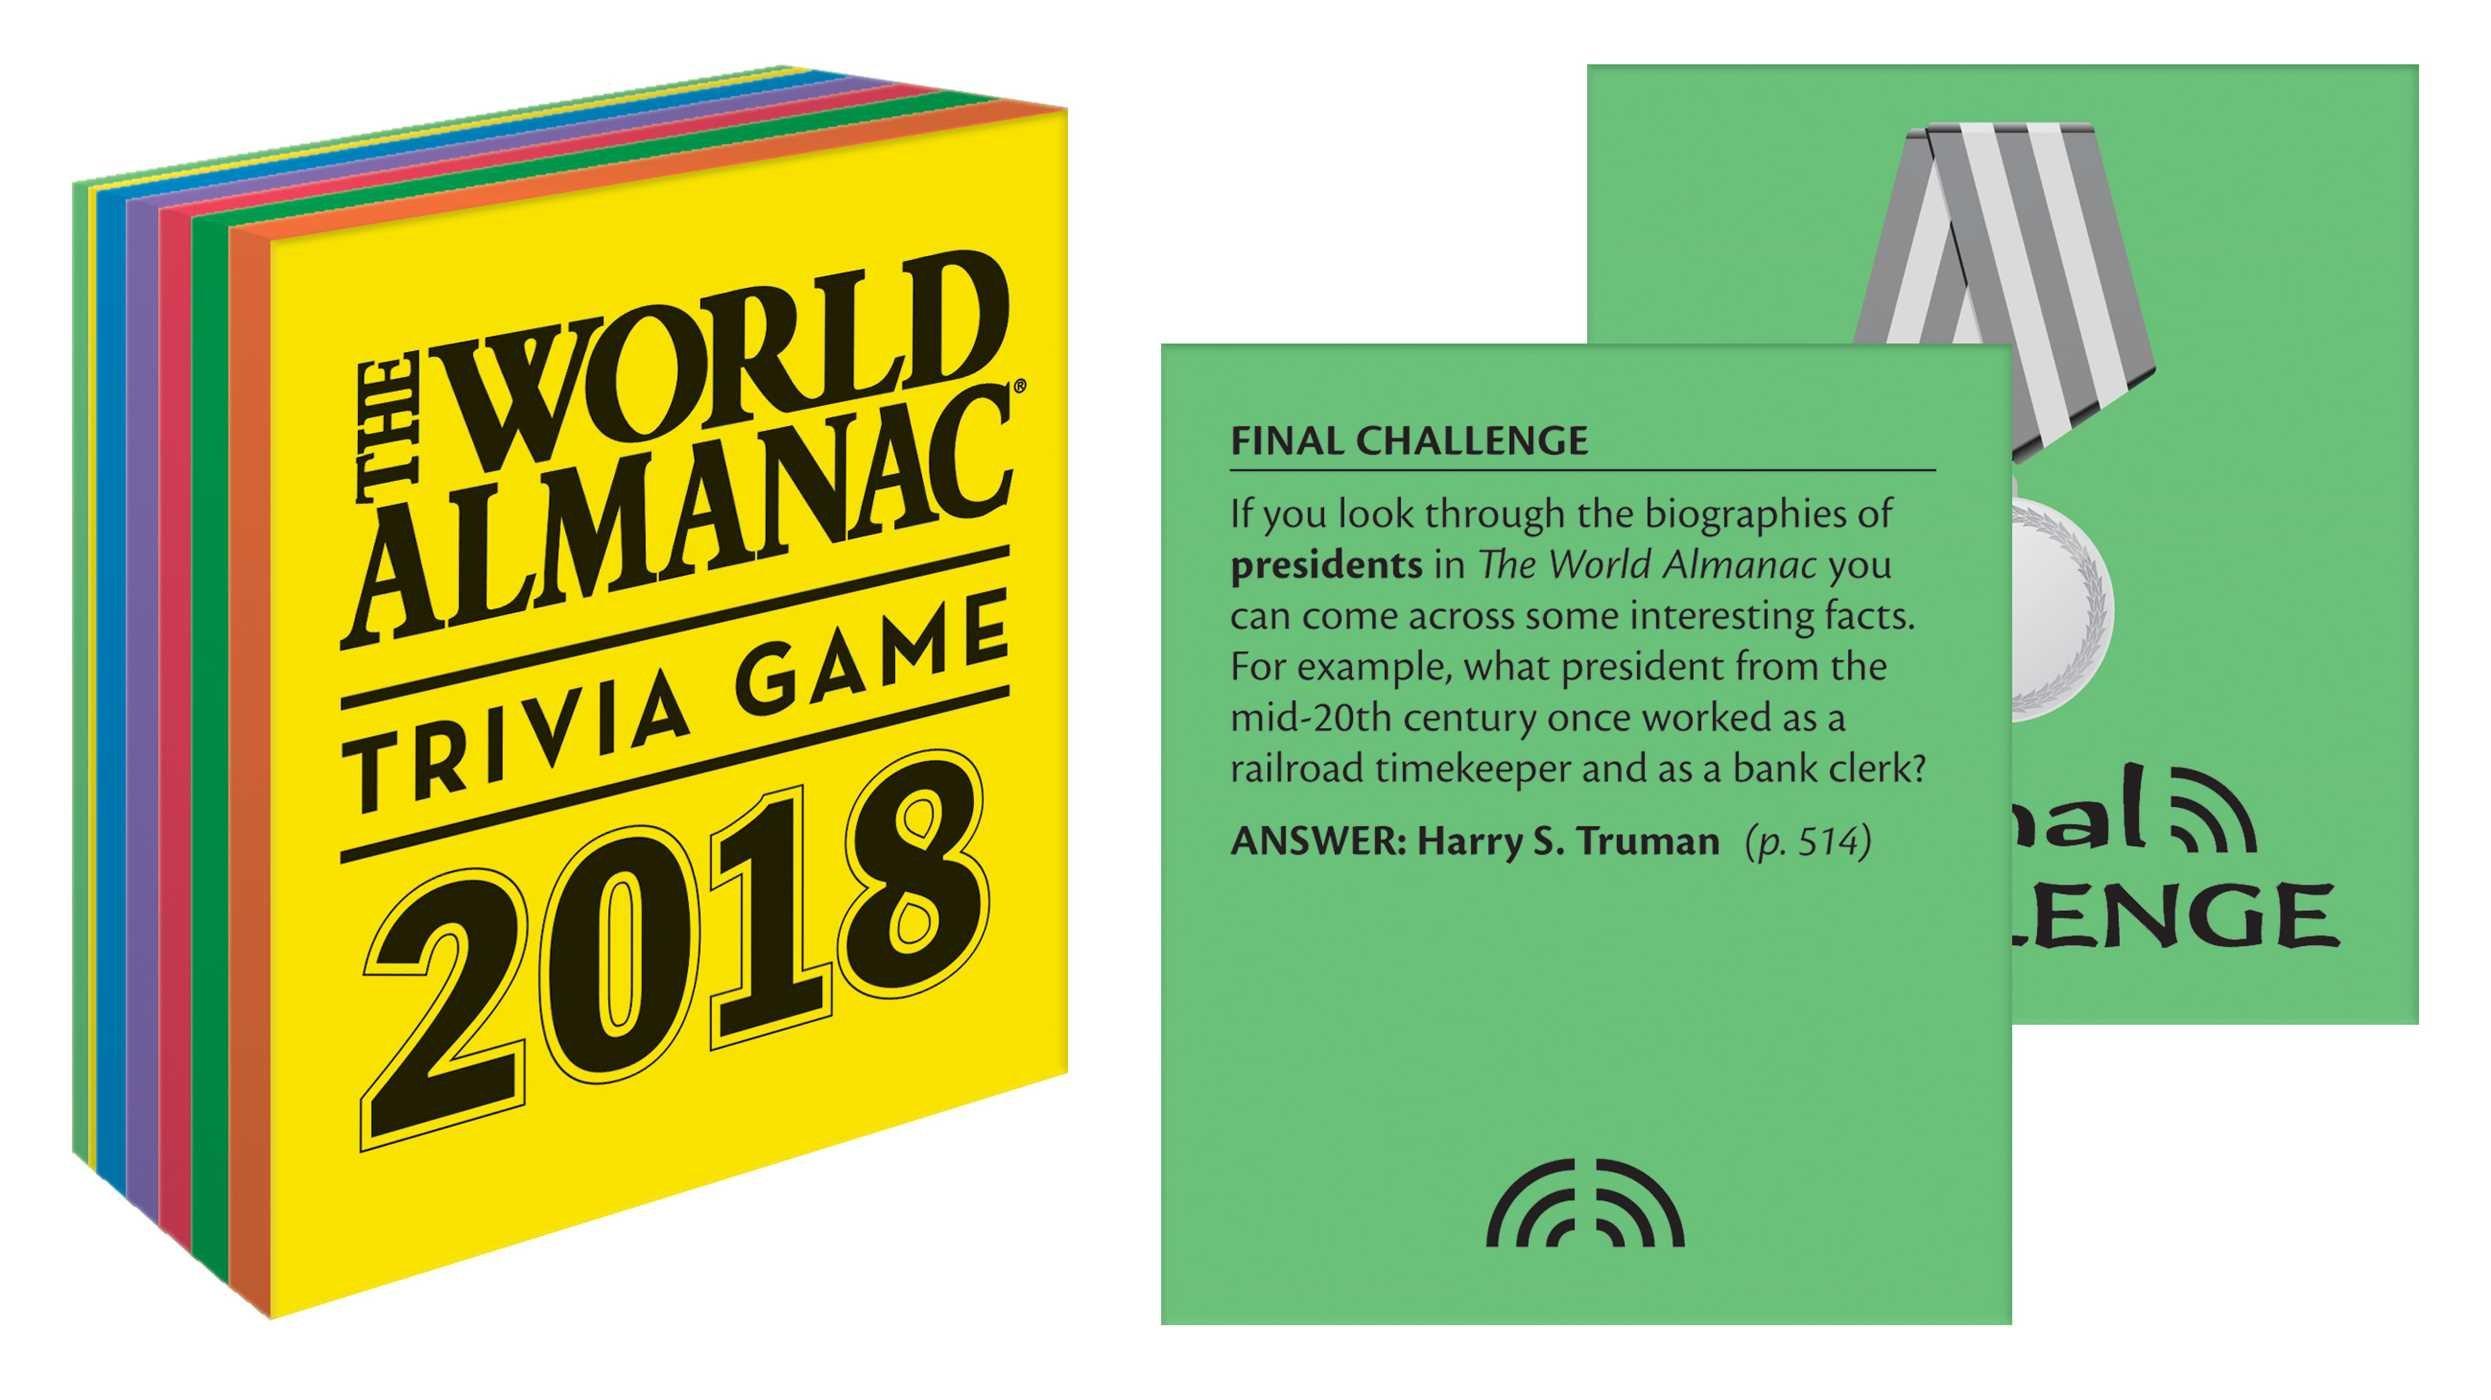 The world almanac 2018 trivia game world almanac and book of facts the world almanac 2018 trivia game world almanac and book of facts sarah janssen 9781600572166 amazon books fandeluxe Gallery